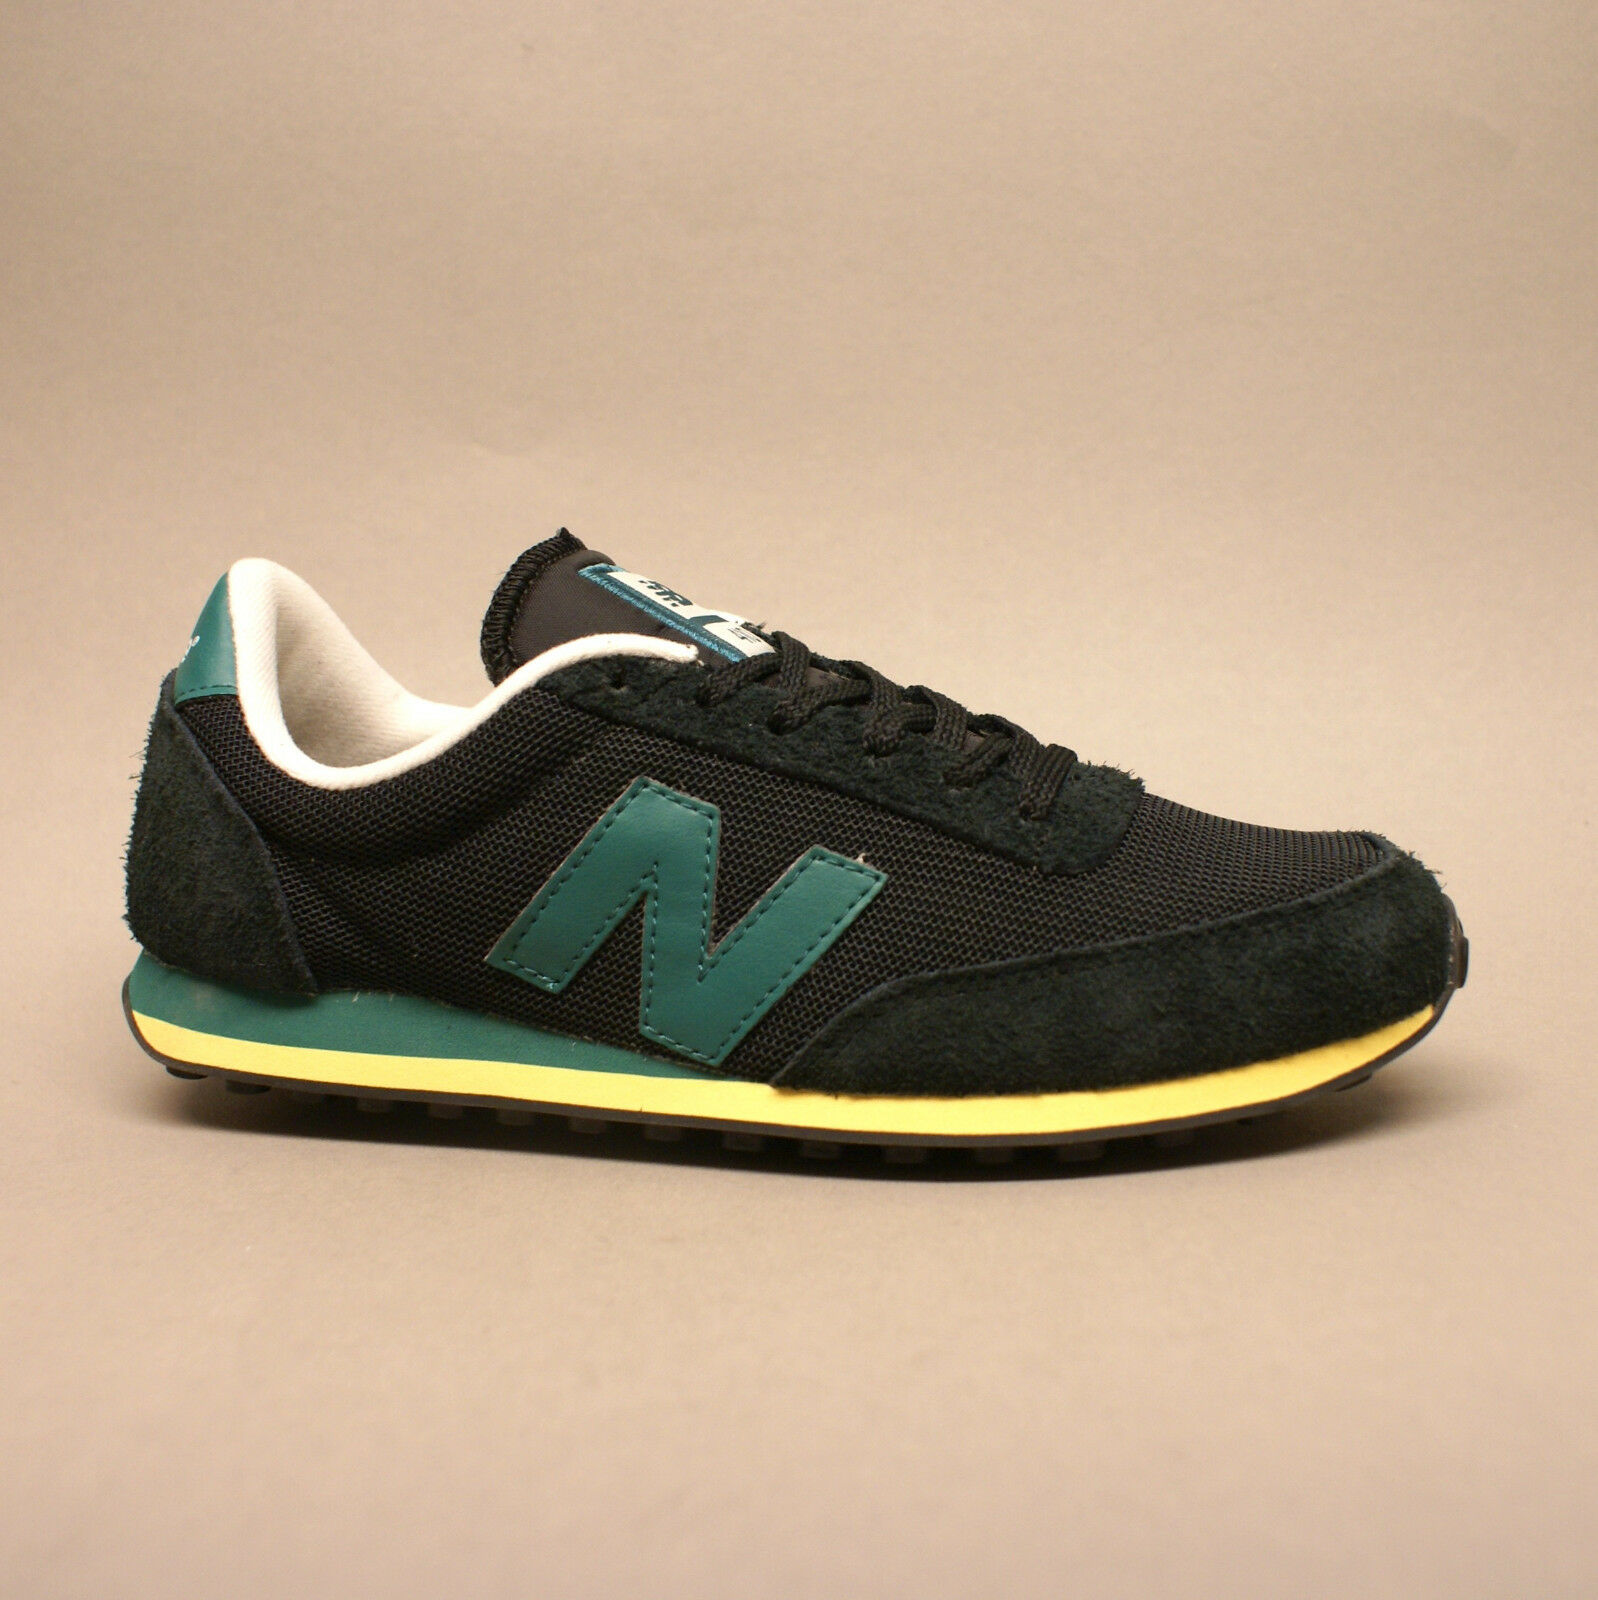 New Balance Classics Traditionnels U410VGG Black Turnschuhe Sneaker schwarz grün